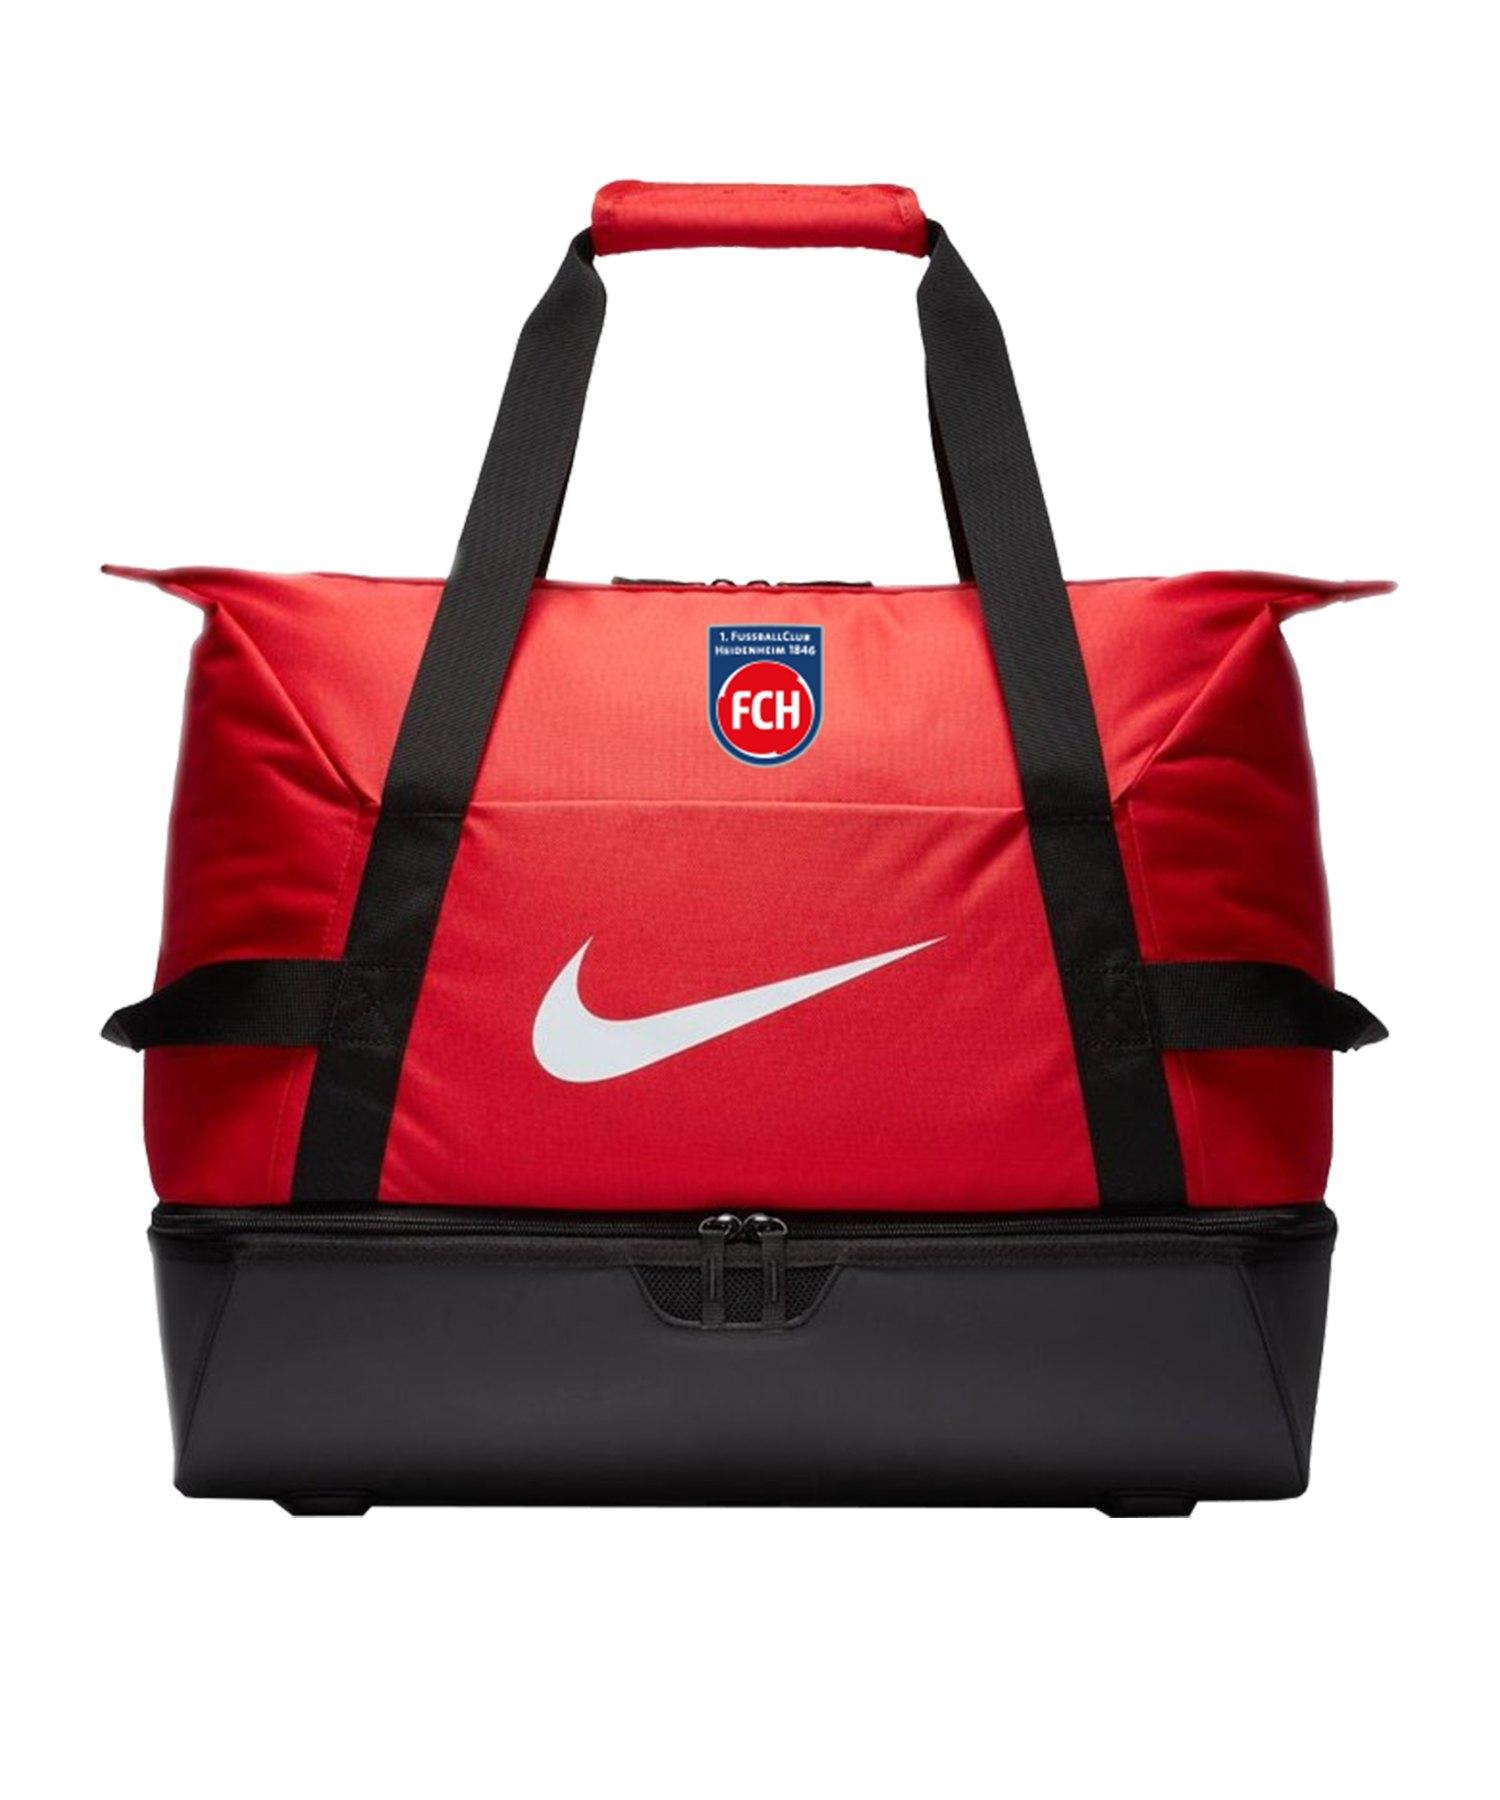 Nike 1. FC Heidenheim Sporttasche Large Rot F657 - rot